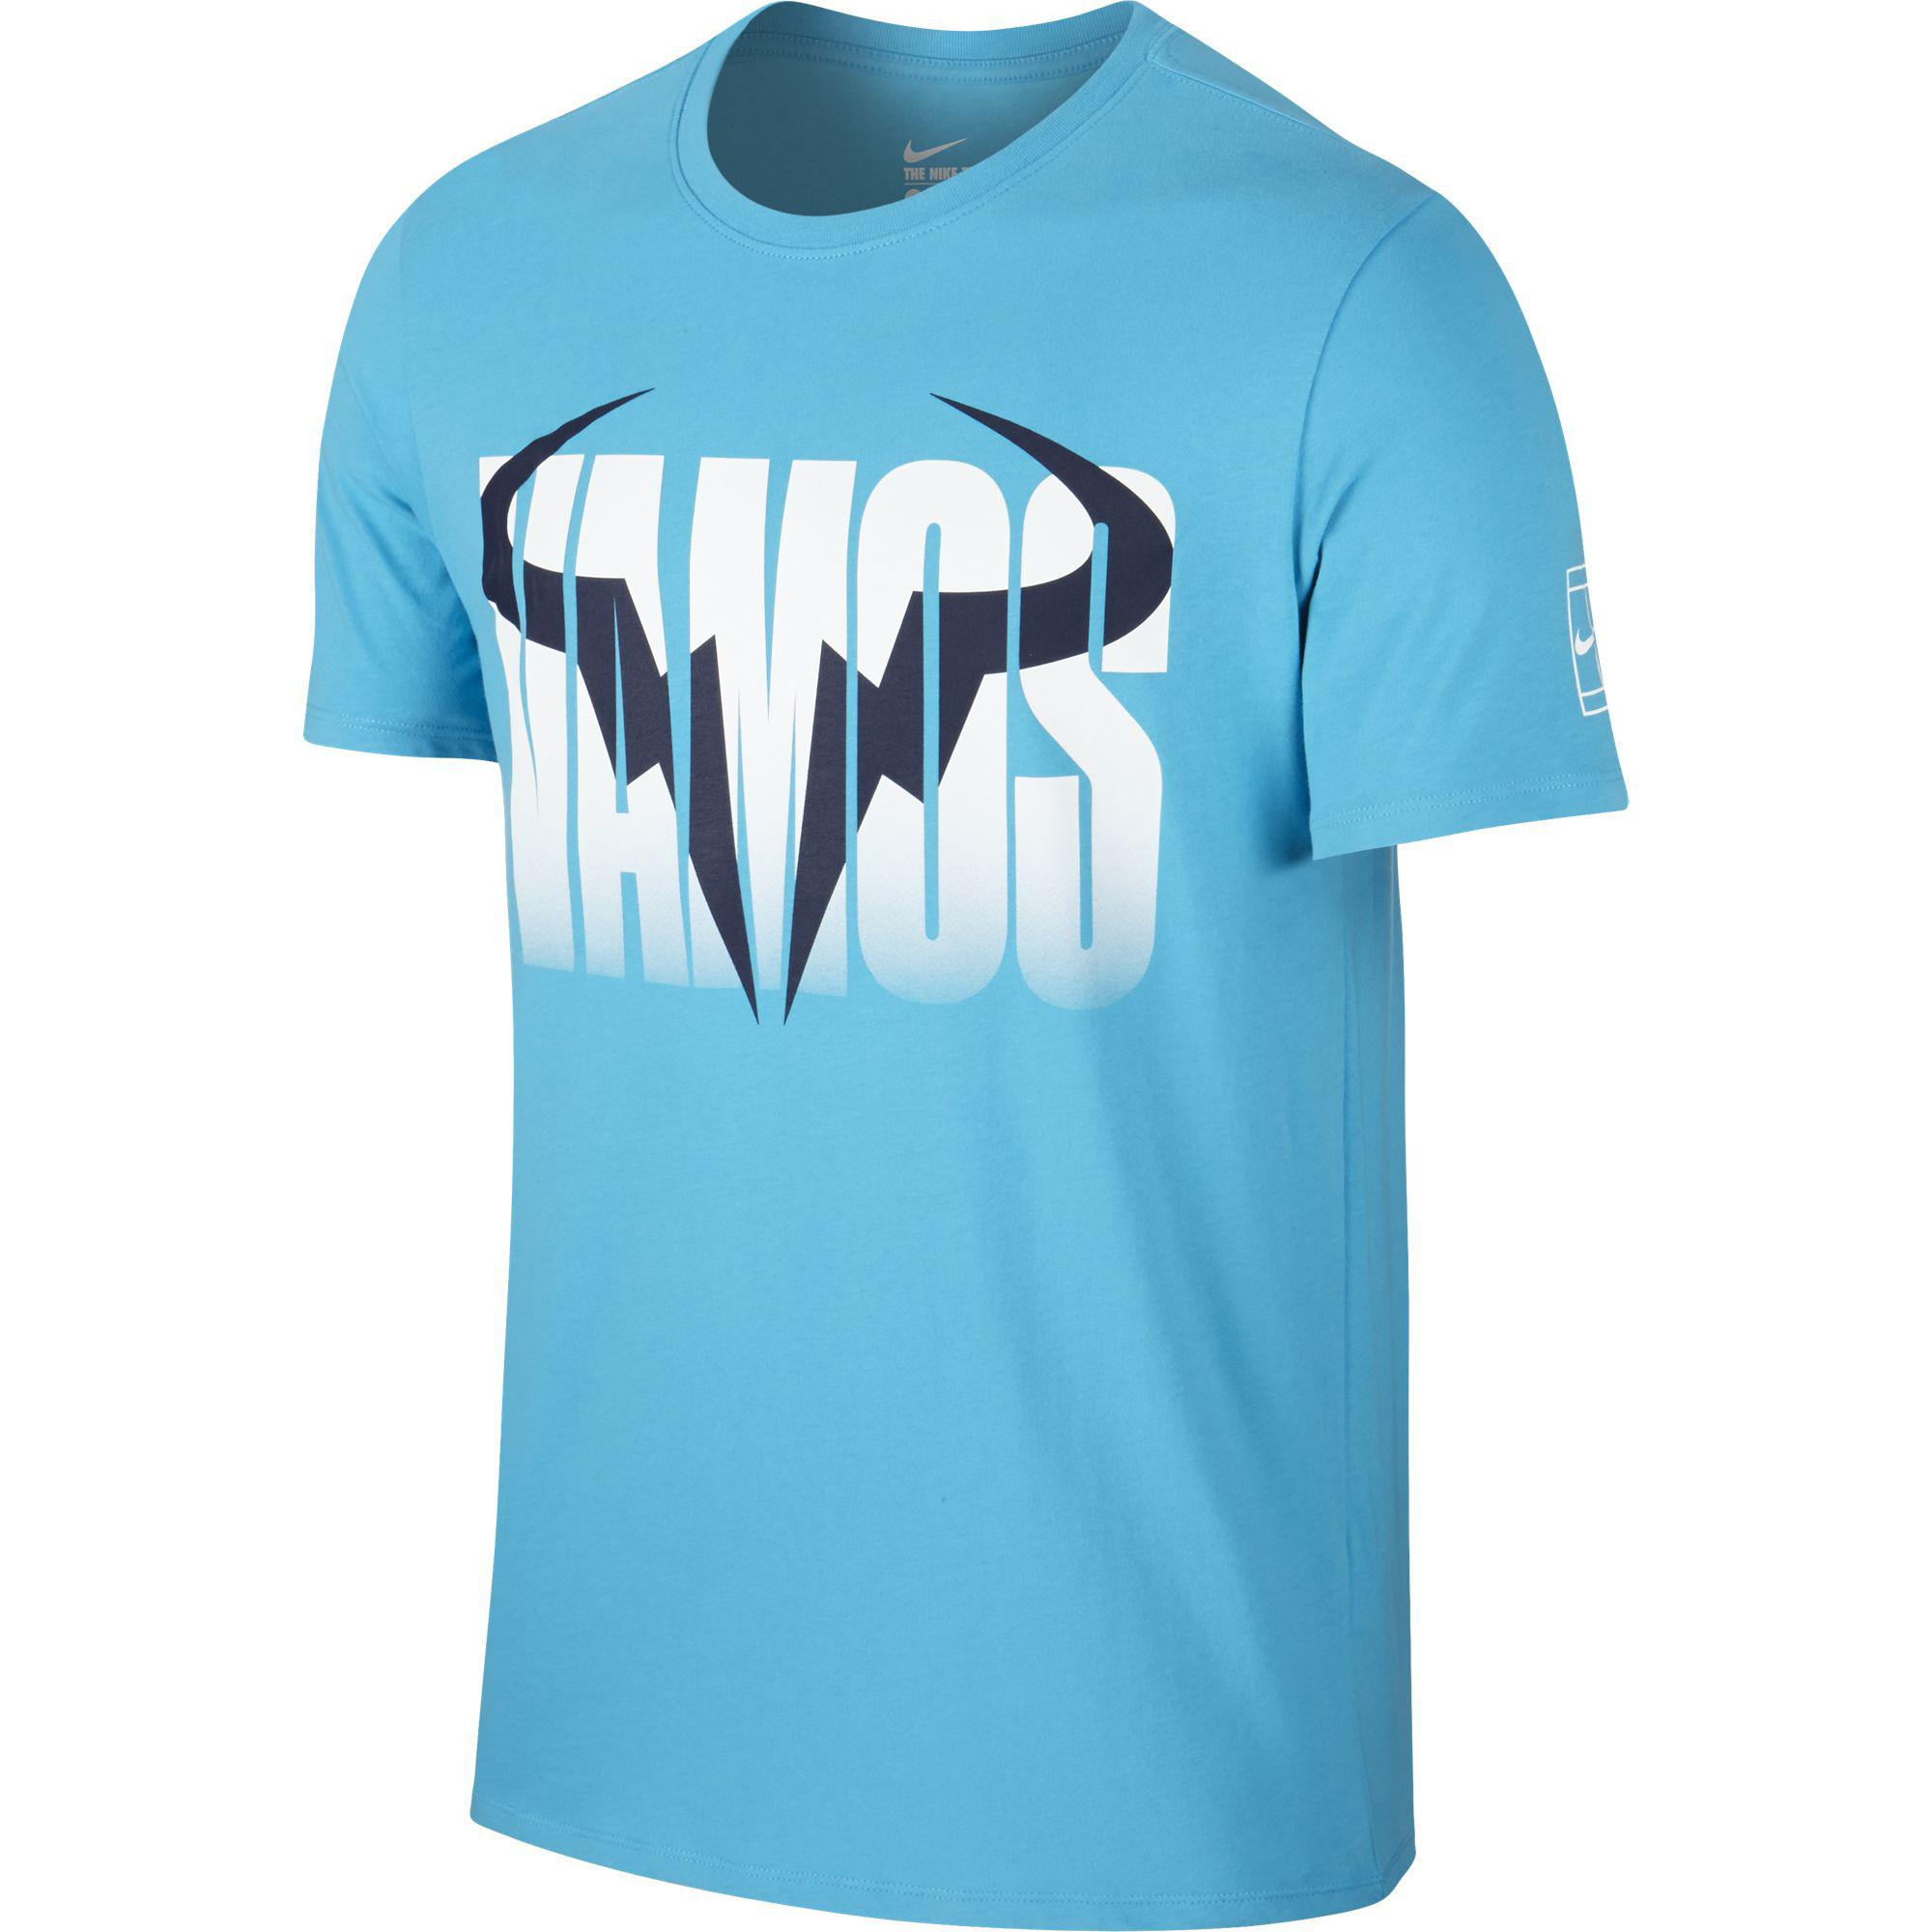 39510dd96 Nike Mens Rafa Crew Short Sleeve Tee - Omega Blue - Tennisnuts.com